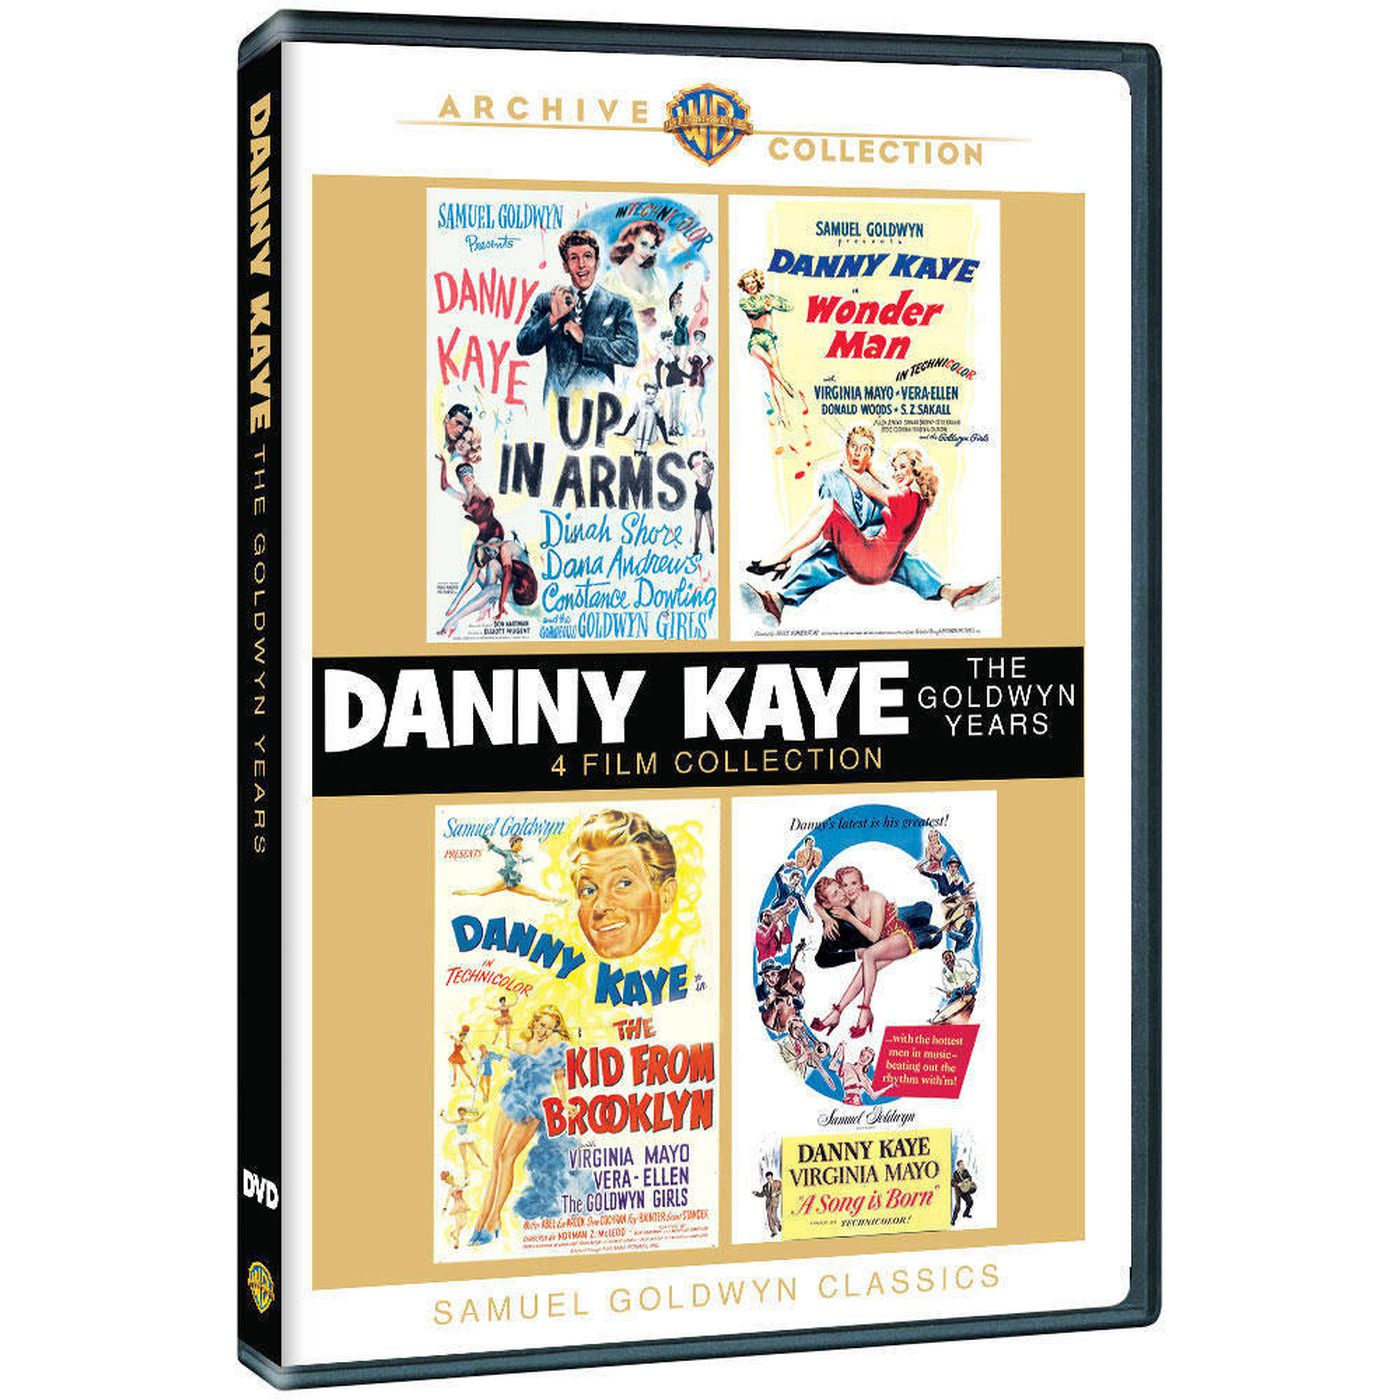 Chris Hicks: 3 films starring Danny Kaye make their DVD